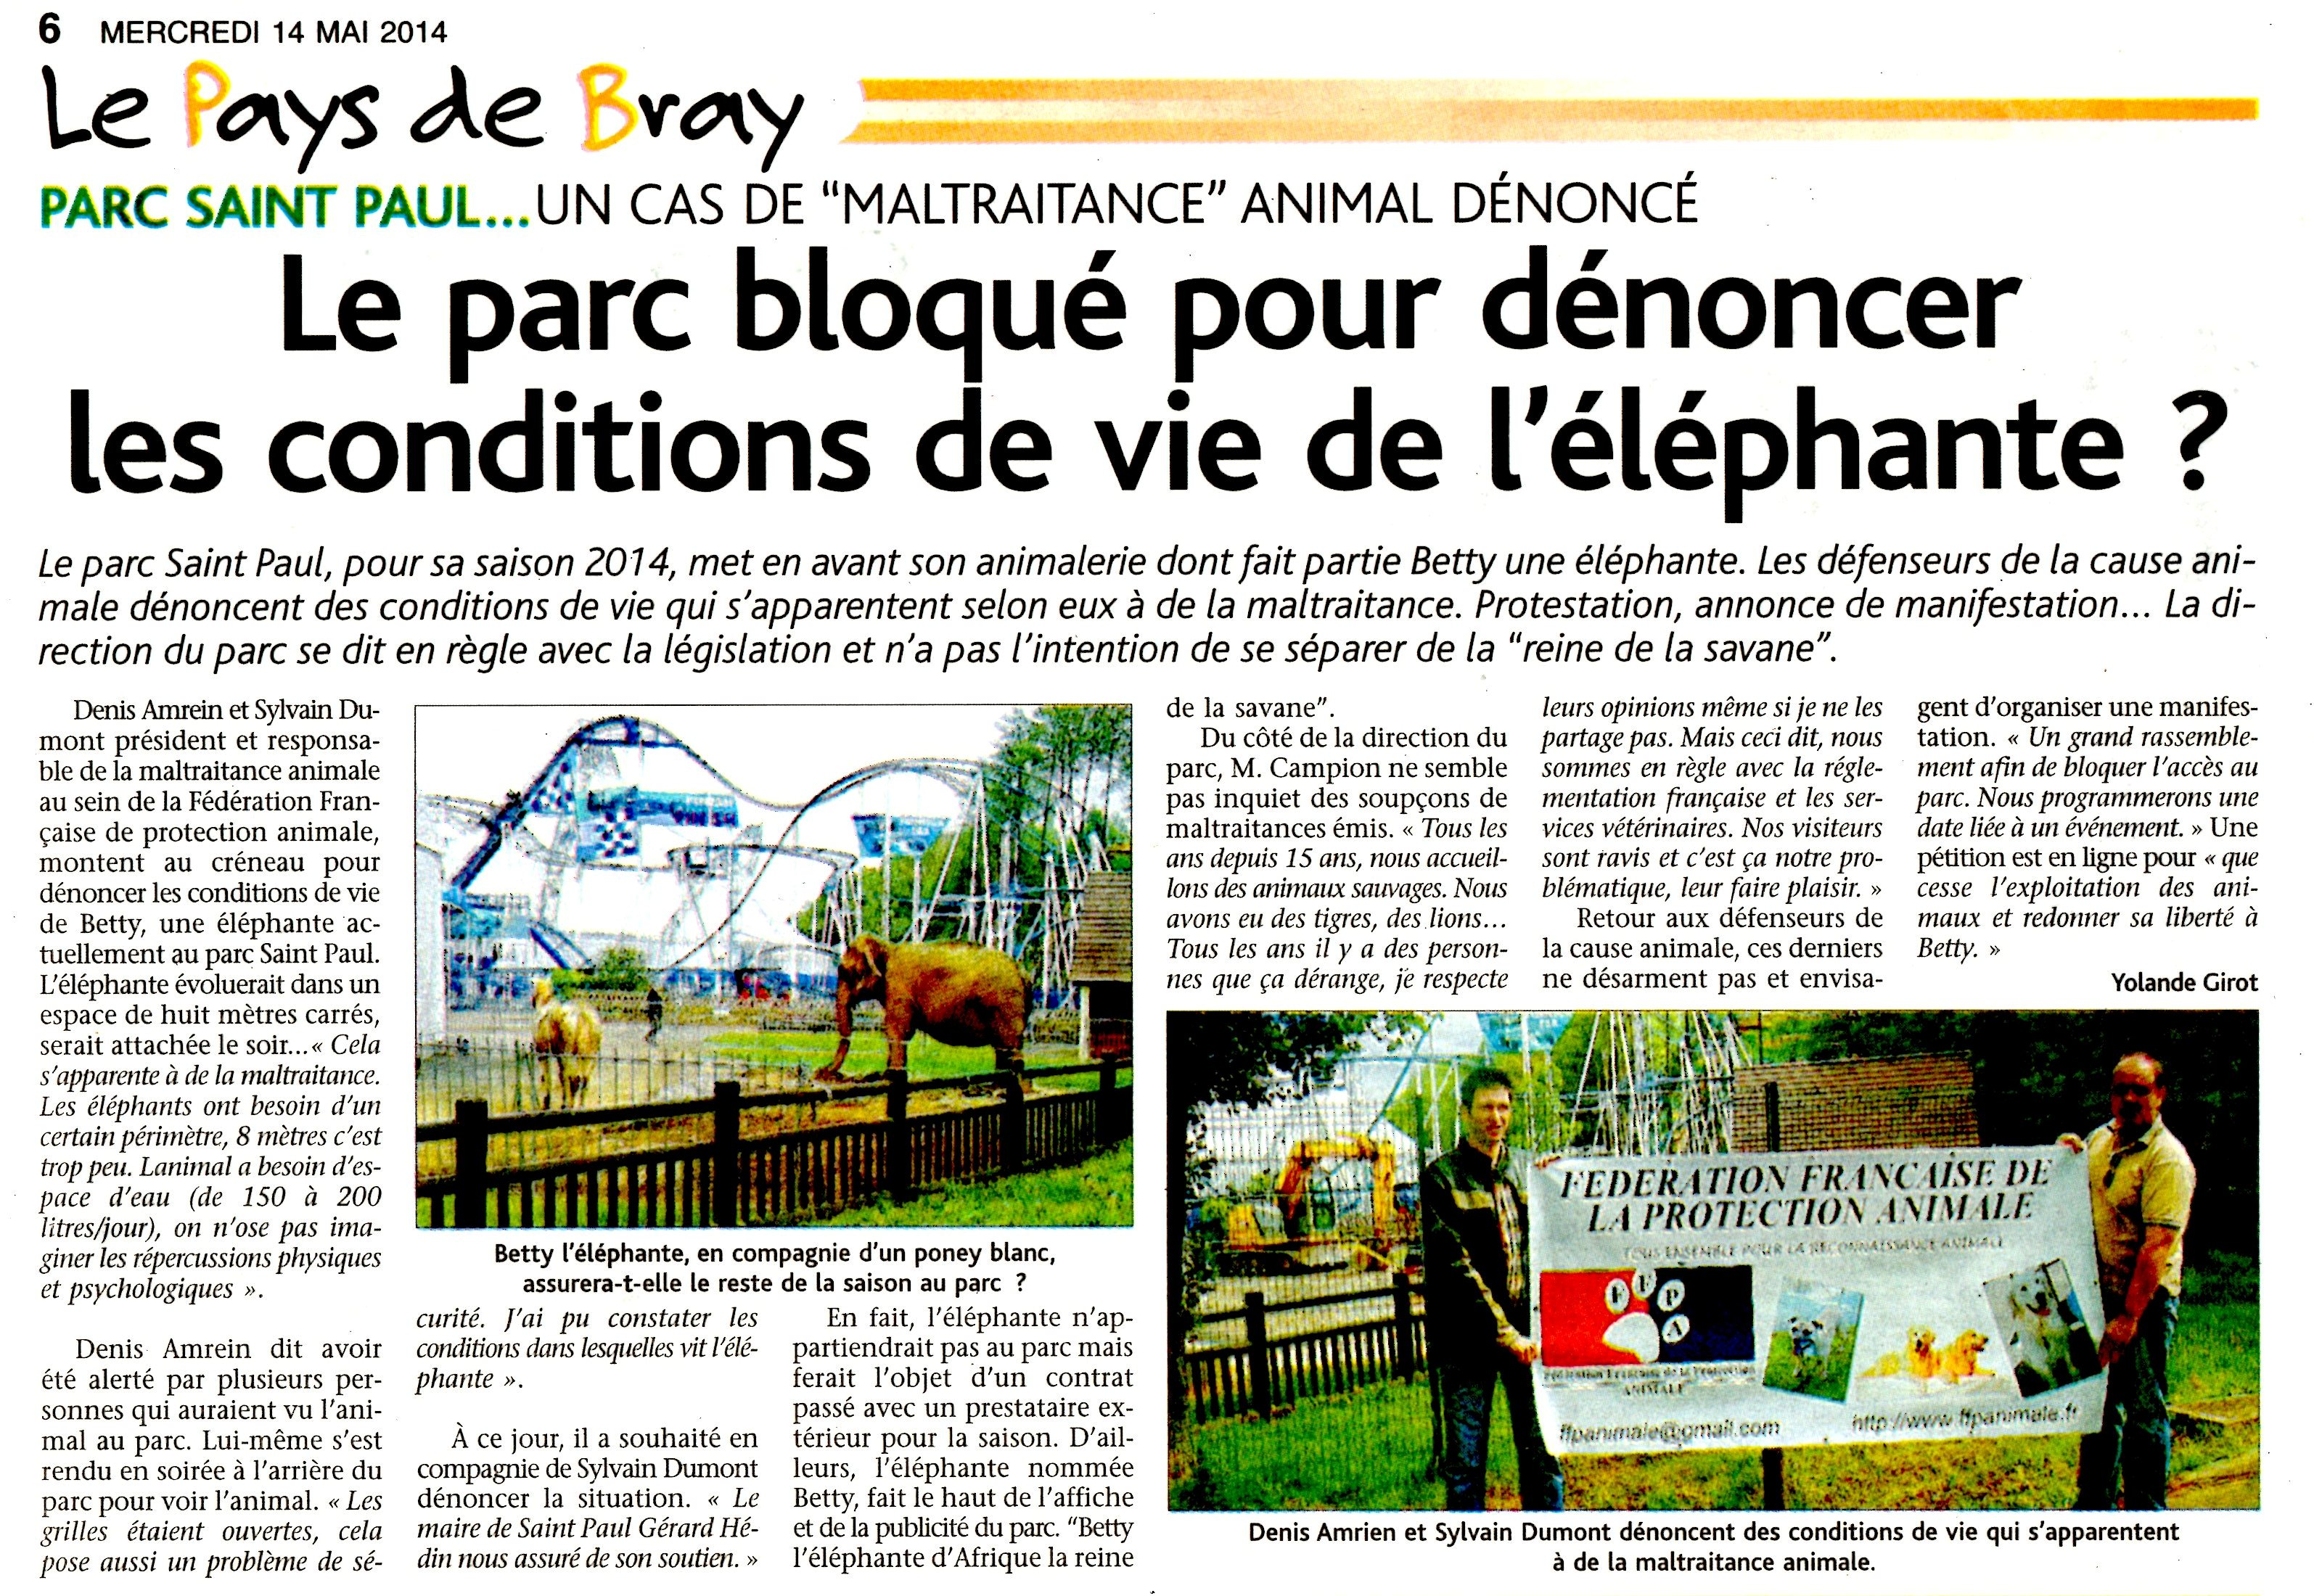 L'ECLAIREUR PAYS DE BRAY 14 MAI 2014 BEETY